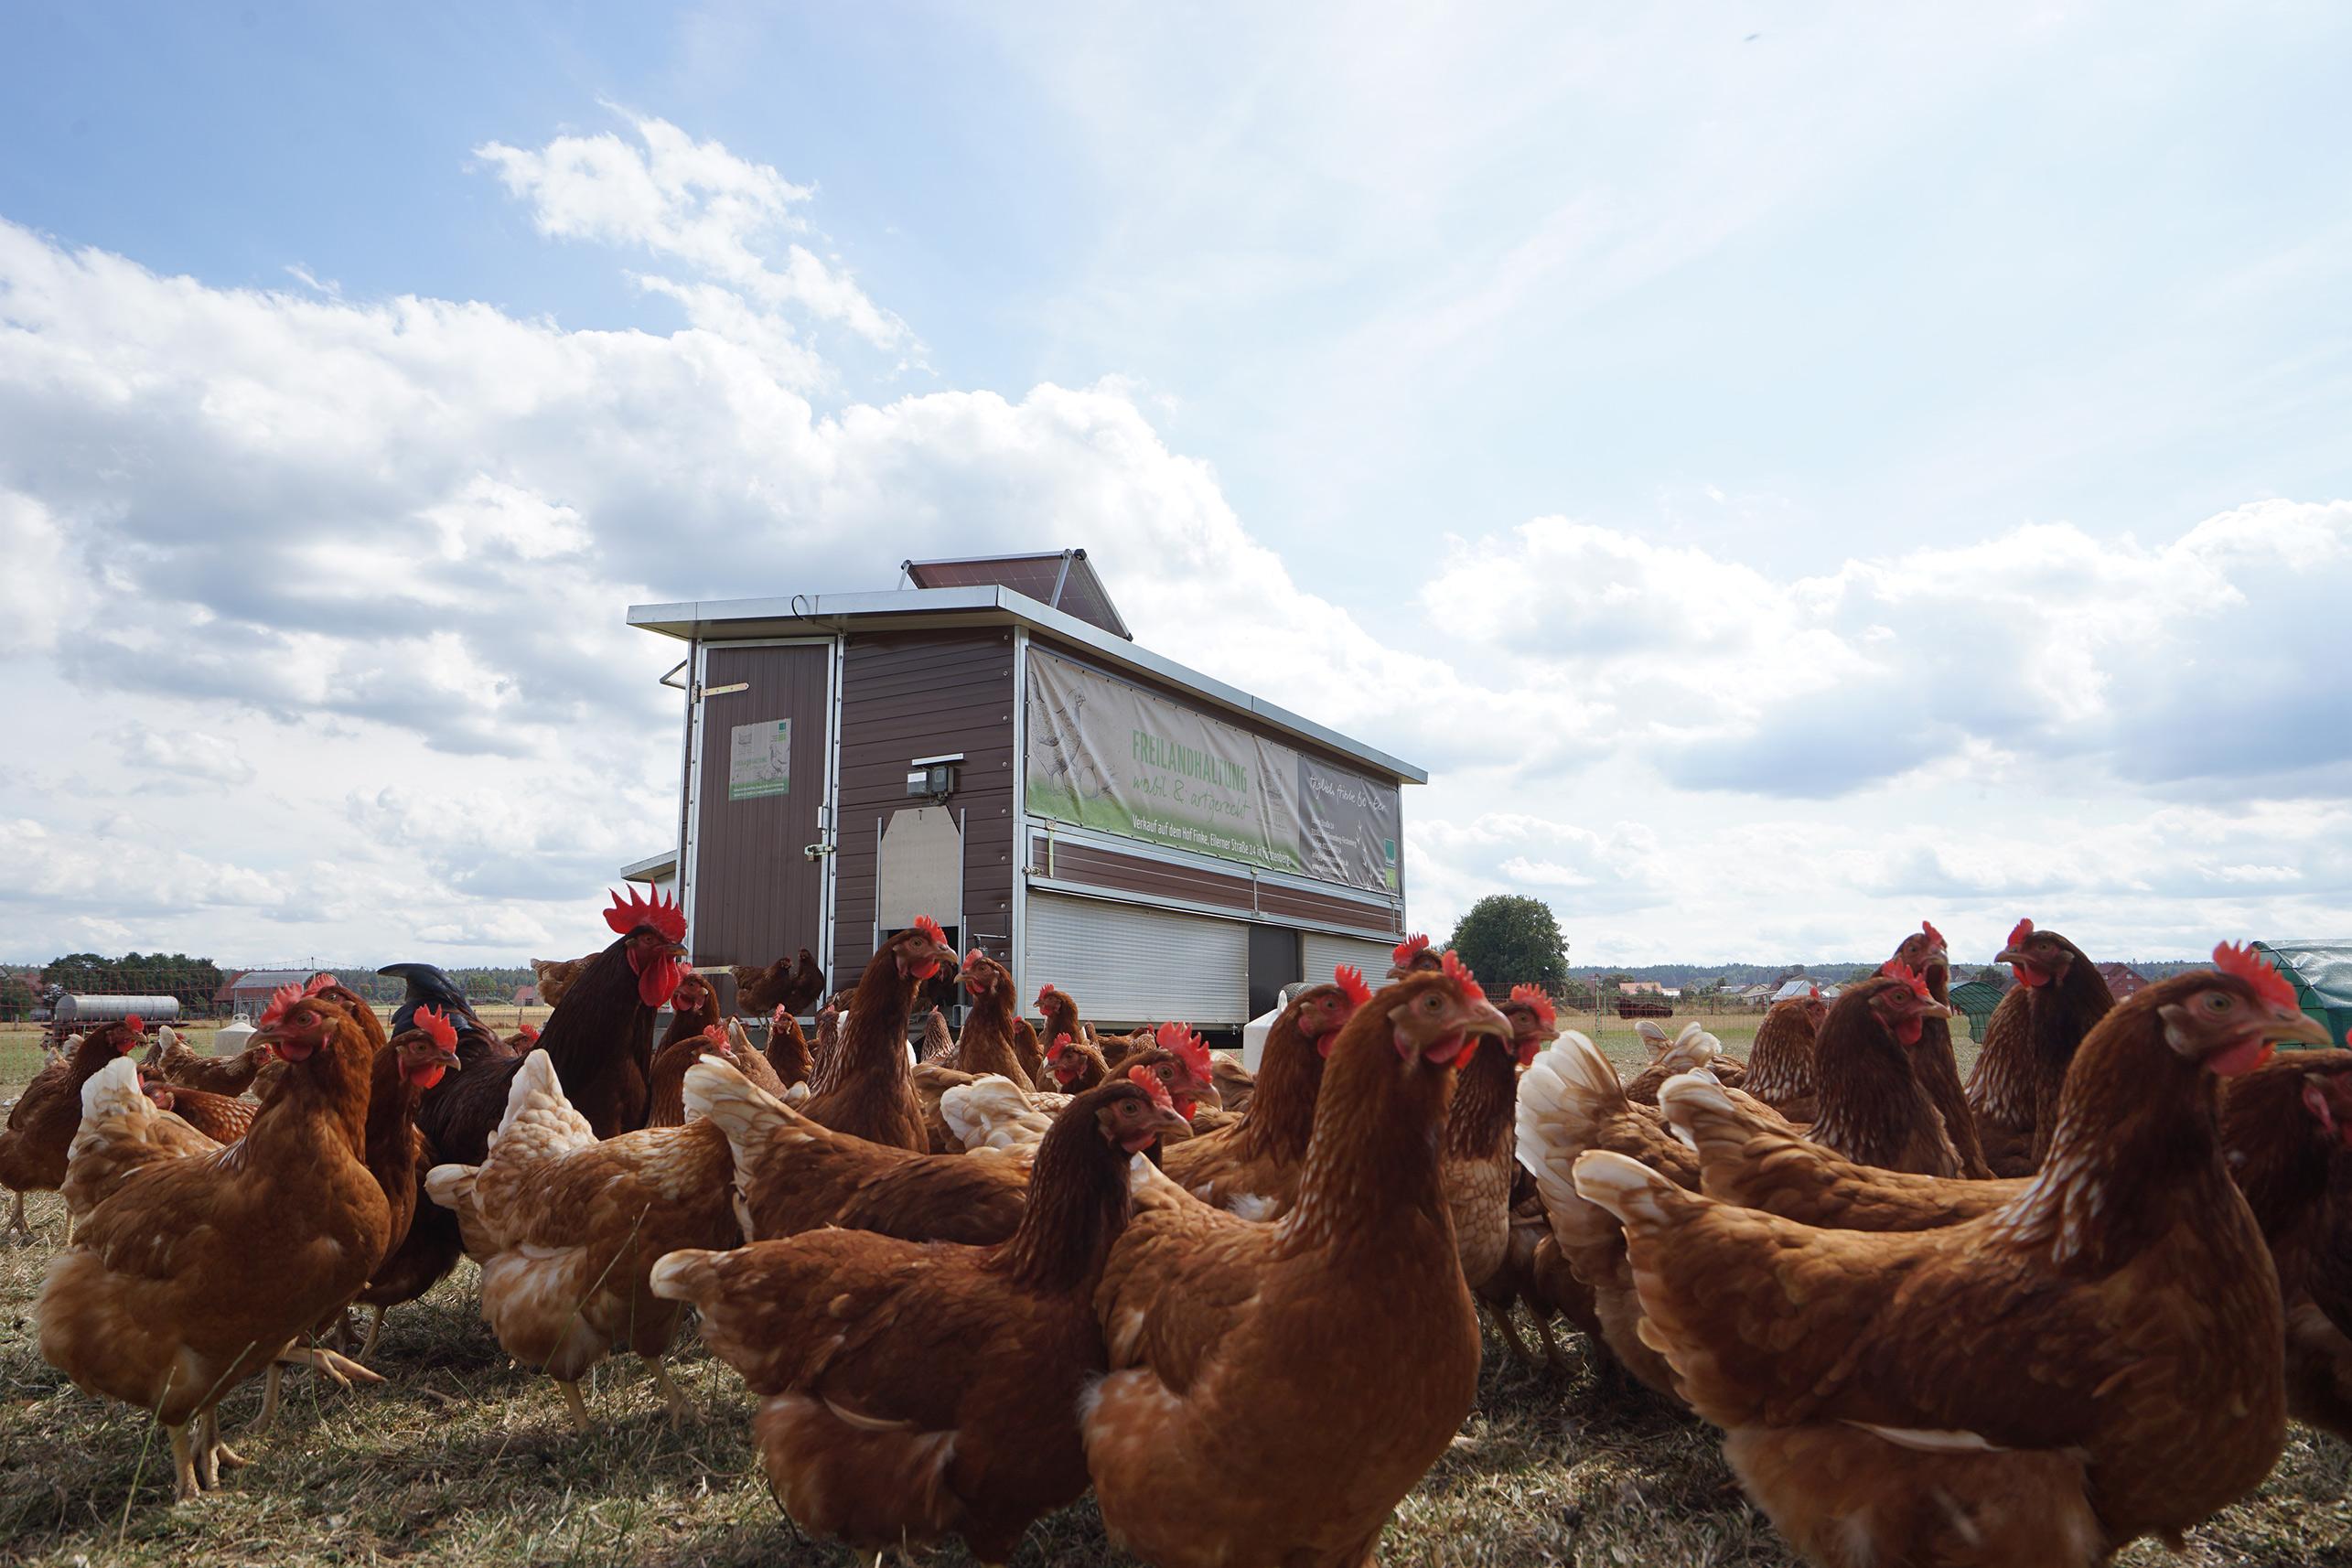 Hühnermobil mit Hühner